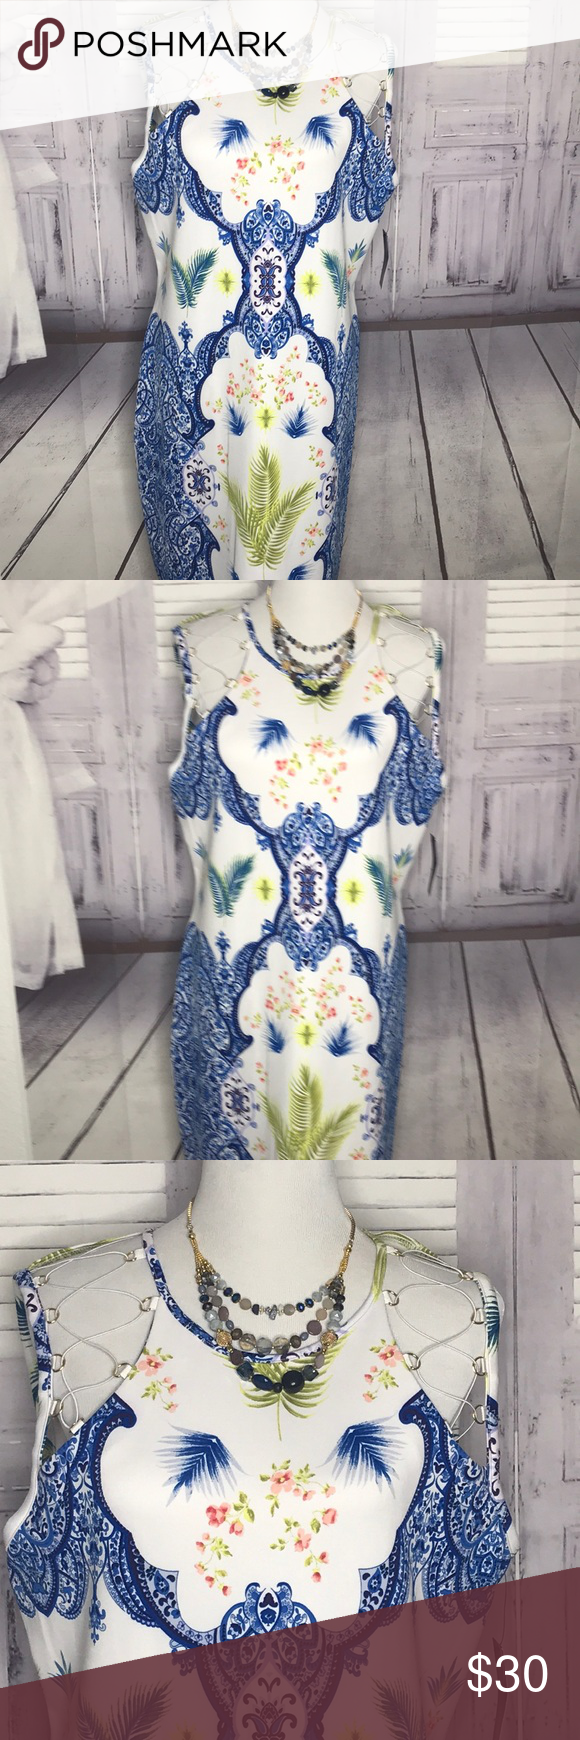 New Gorgeous Dress Size 2x Beach Dress Gorgeous Dresses Element Dress Beautiful Summer Dresses [ 1740 x 580 Pixel ]